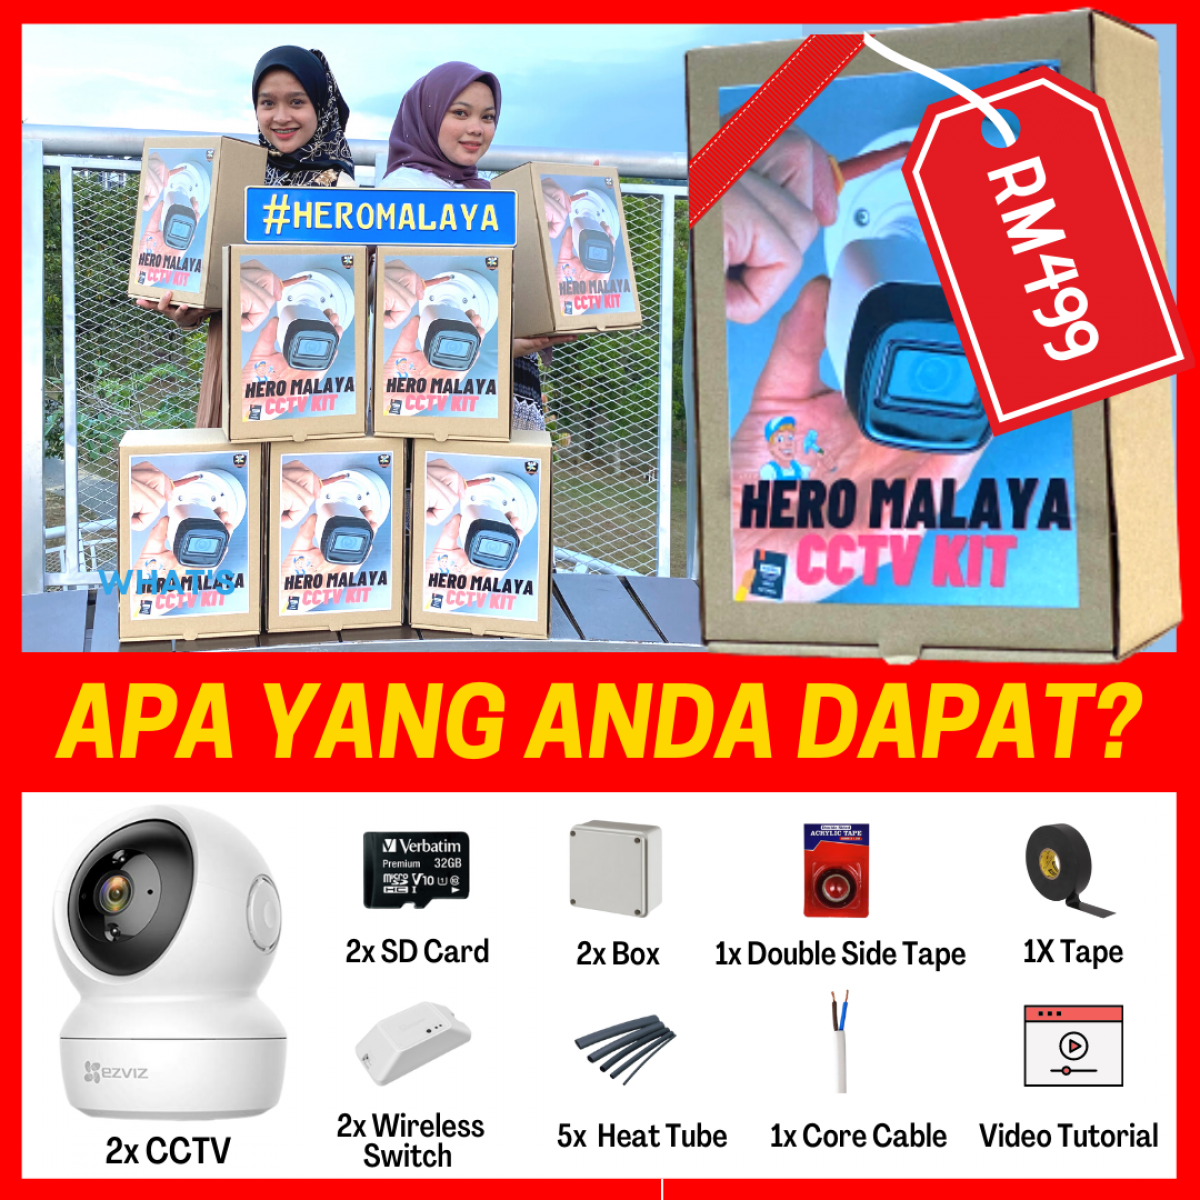 HERO MALAYA CCTV KIT BOX | Wireless CCTV HD Motion Tracking - Wireless CCTV